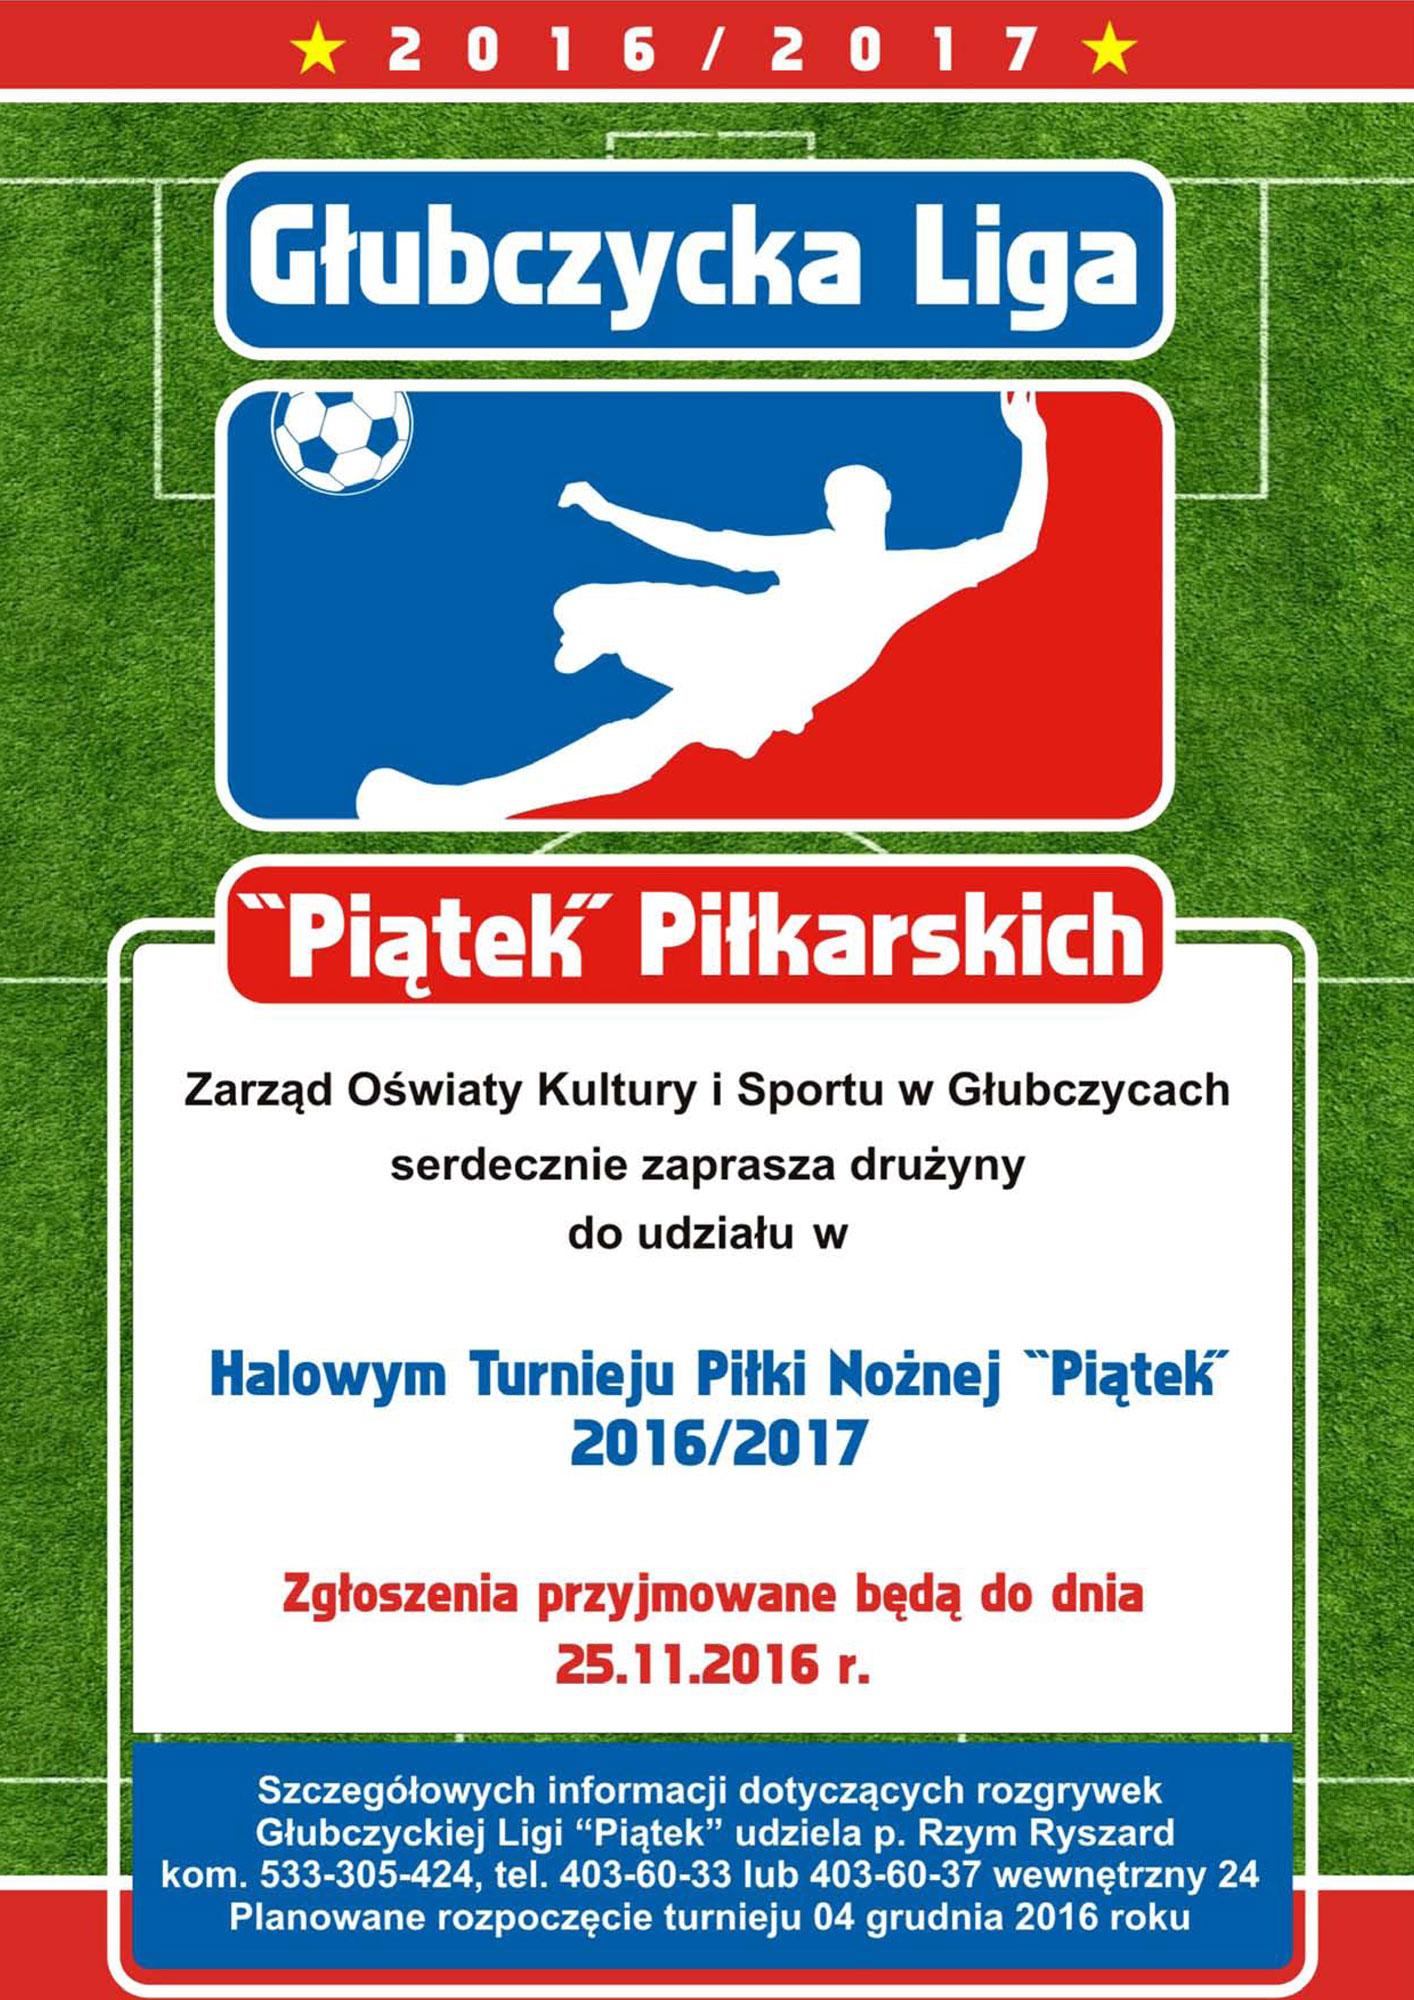 glubczycka-liga-plakat-2016